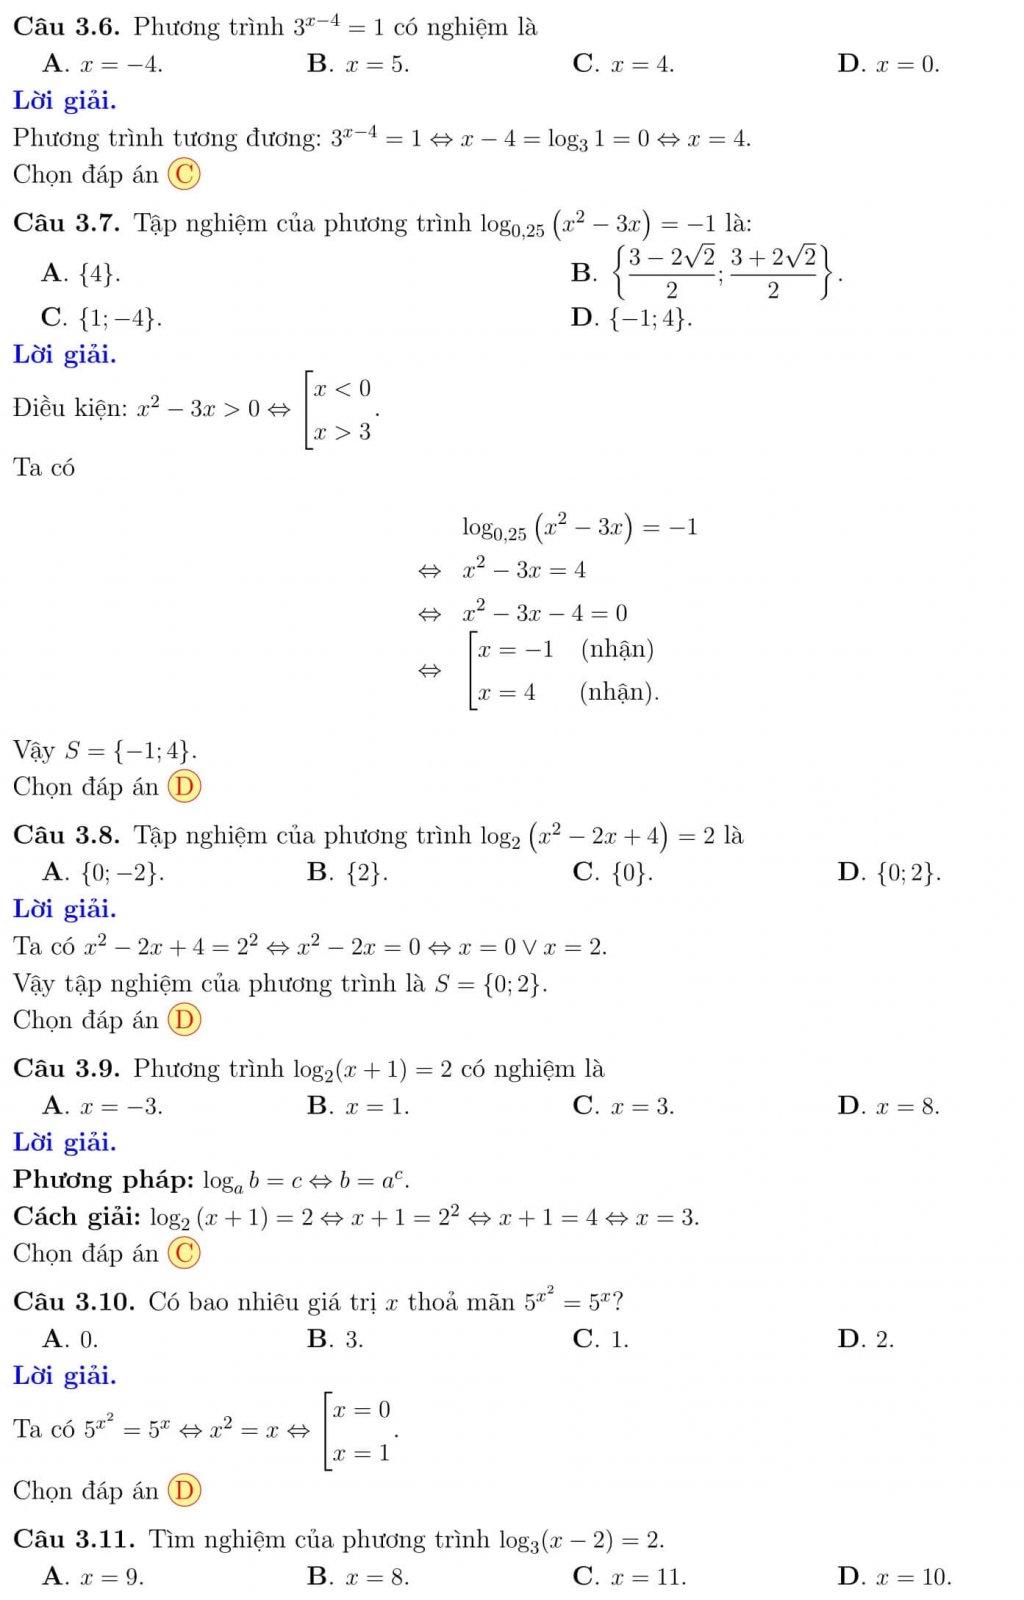 phat-trien-cau-3-phuong-trinh-mu-2-jpg.10498